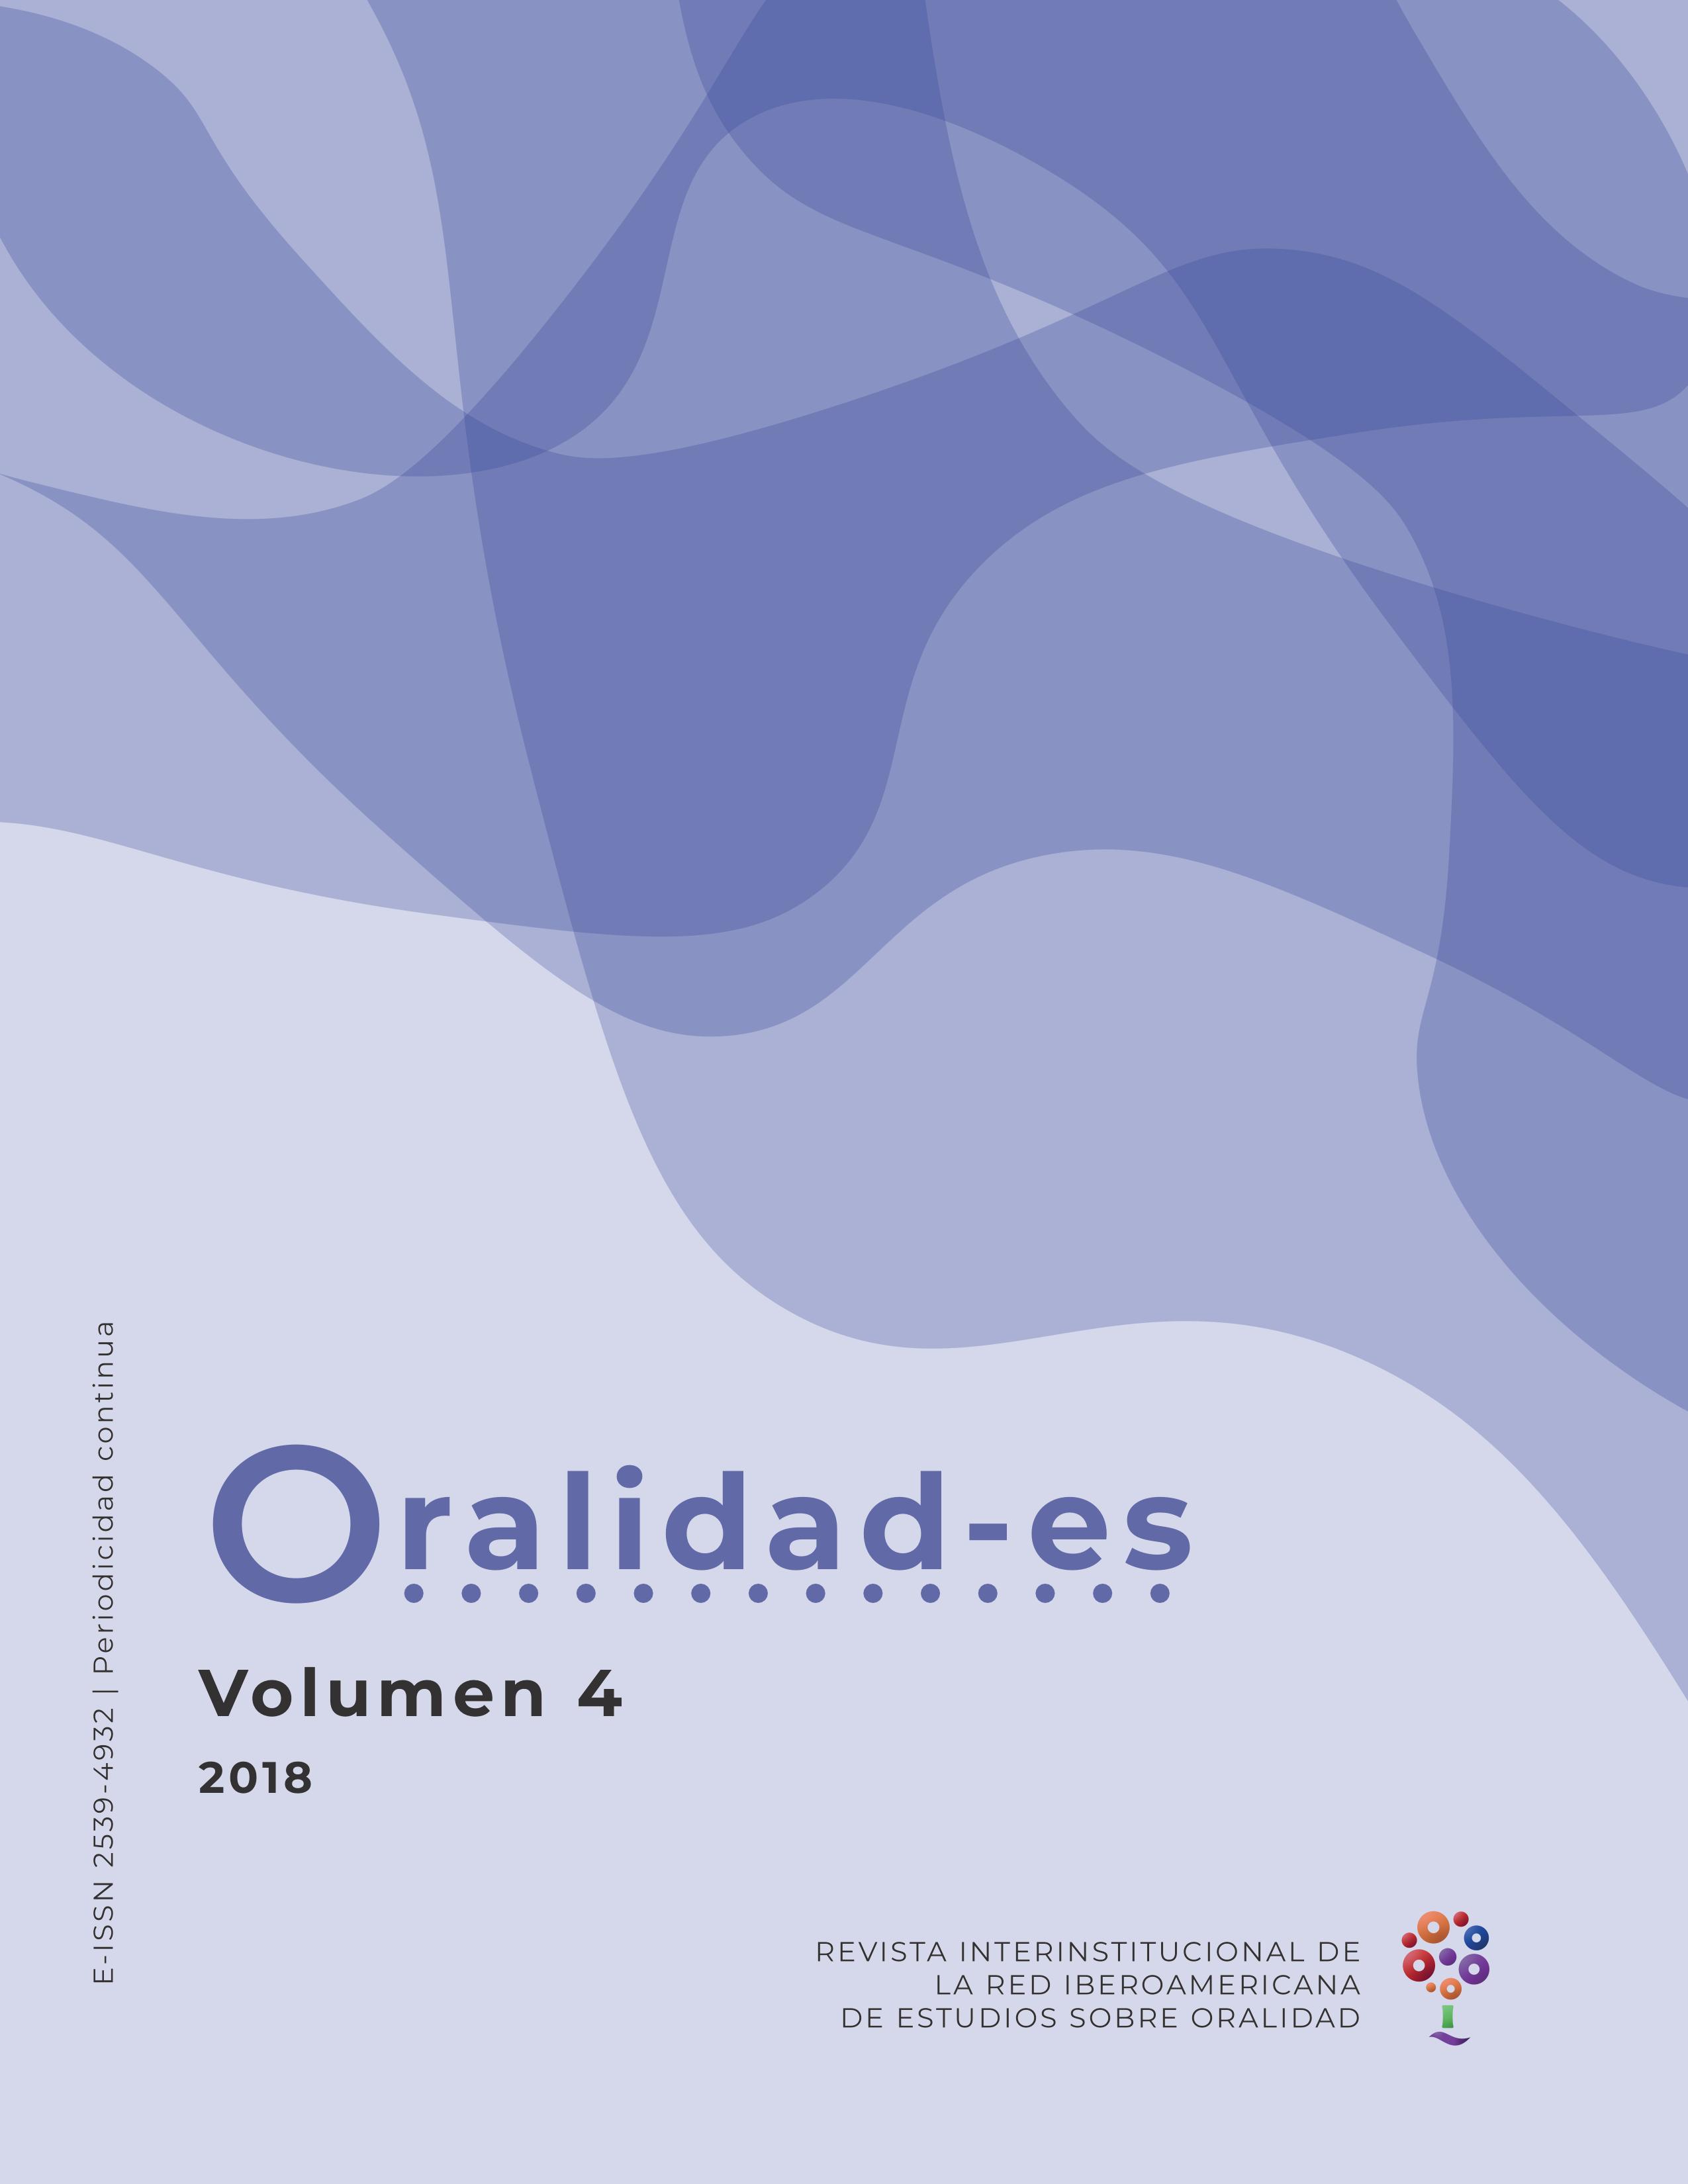 Revista de la Red Iberoamericana de Estudios sobre Oralidad.